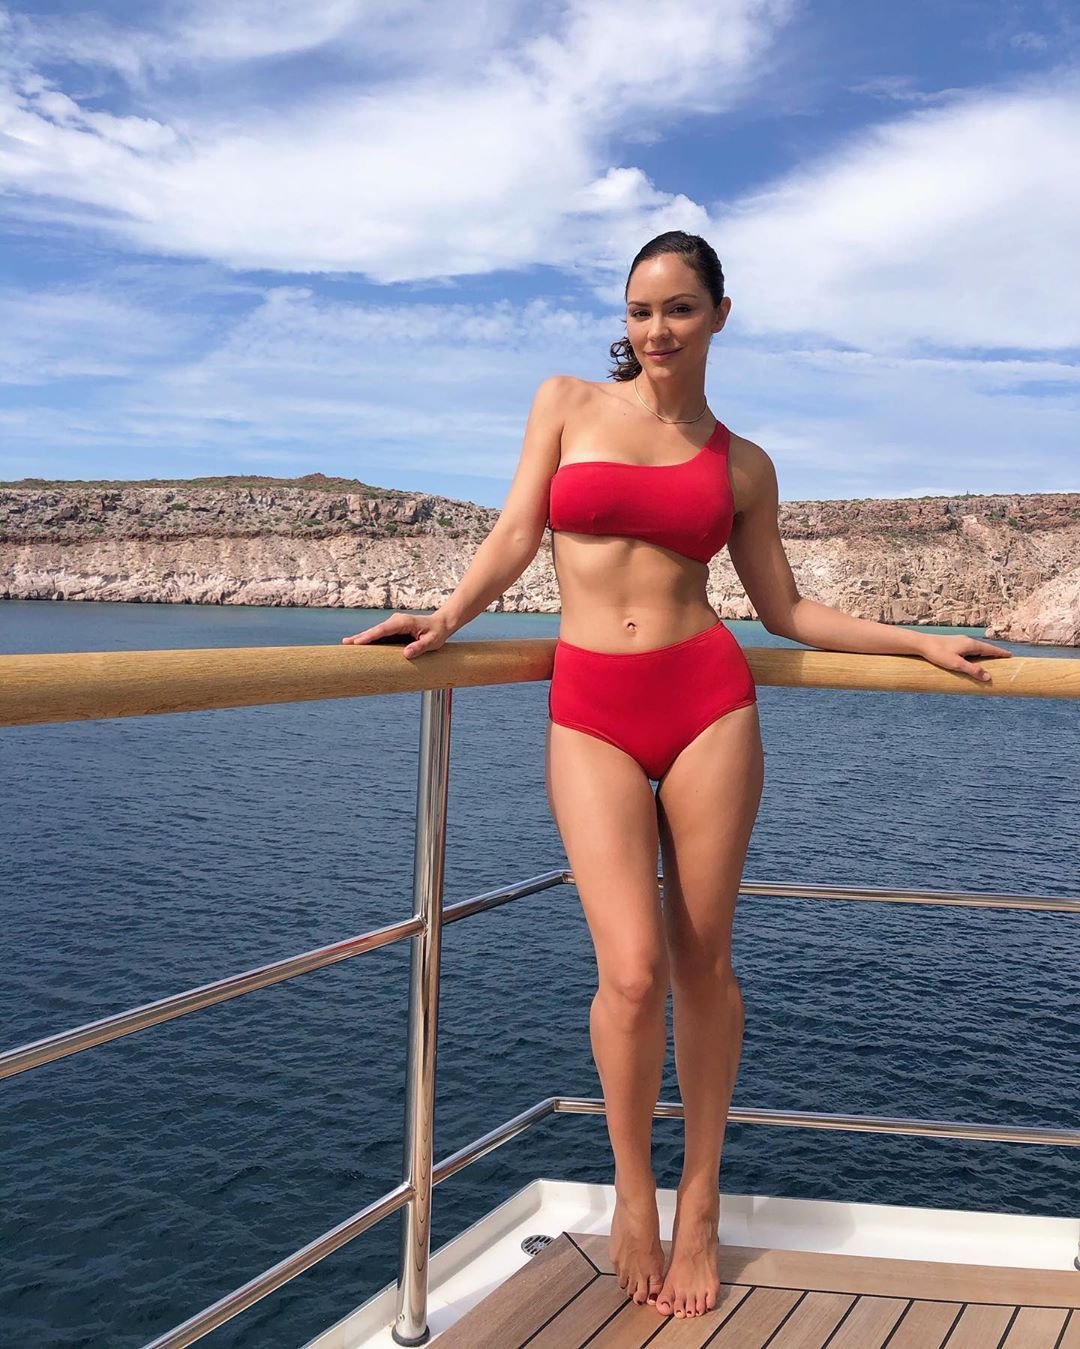 Katharine Mcphee Foster Katharinefoster Instagram Photos And Videos Katharine Mcphee Bikini Katharine Mcphee Celebrity Beaches